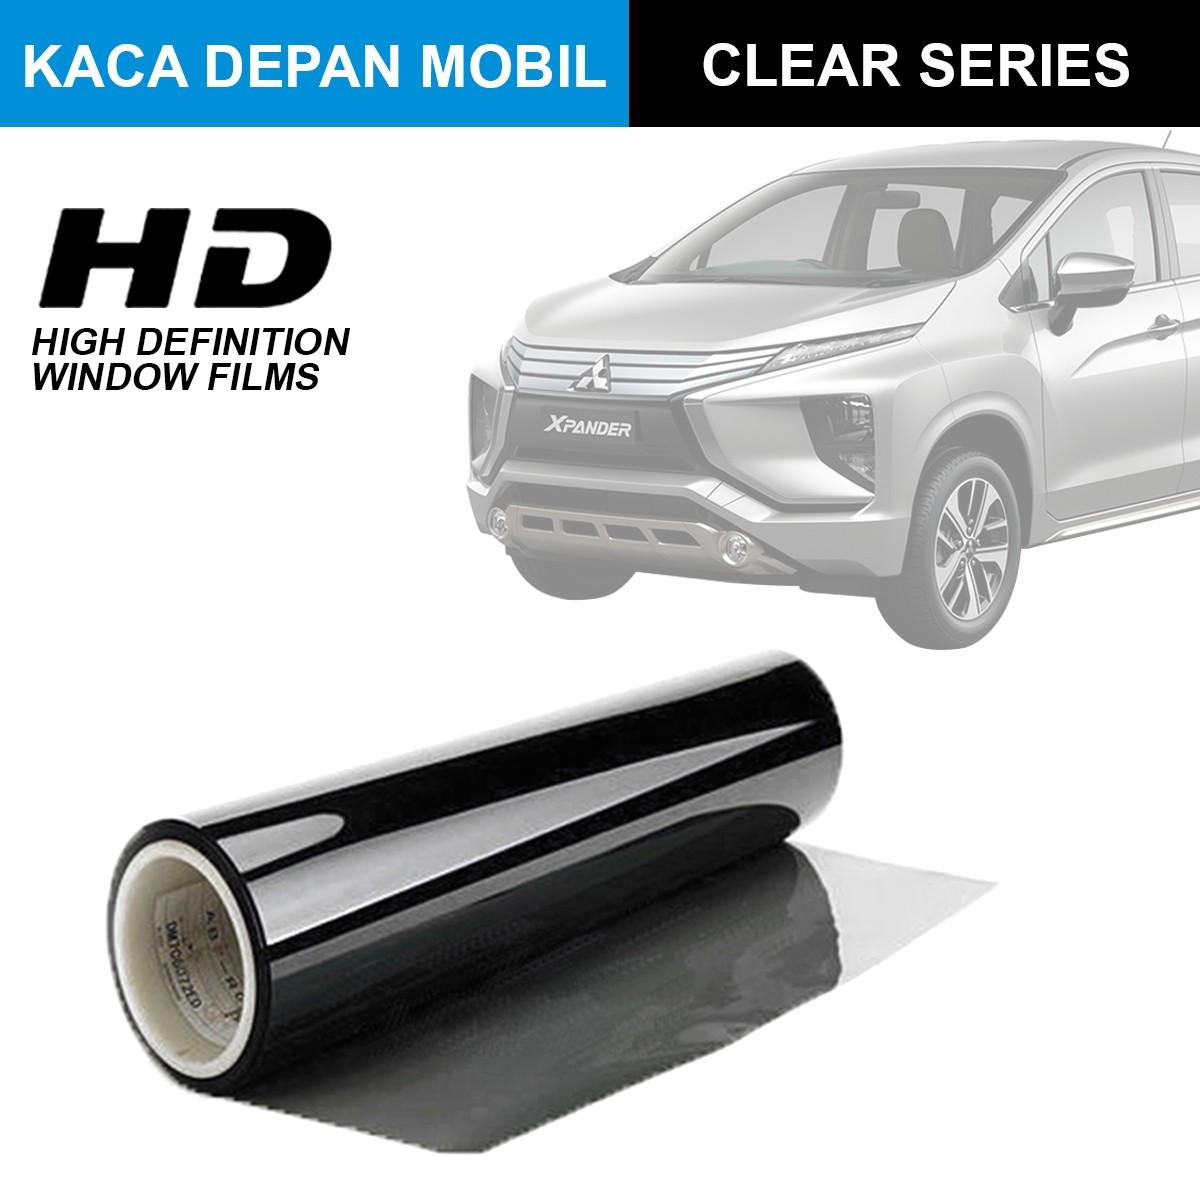 KACA FILM HIGH DEFINITION CLEAR SERIES - (MEDIUM CAR) KACA DEPAN